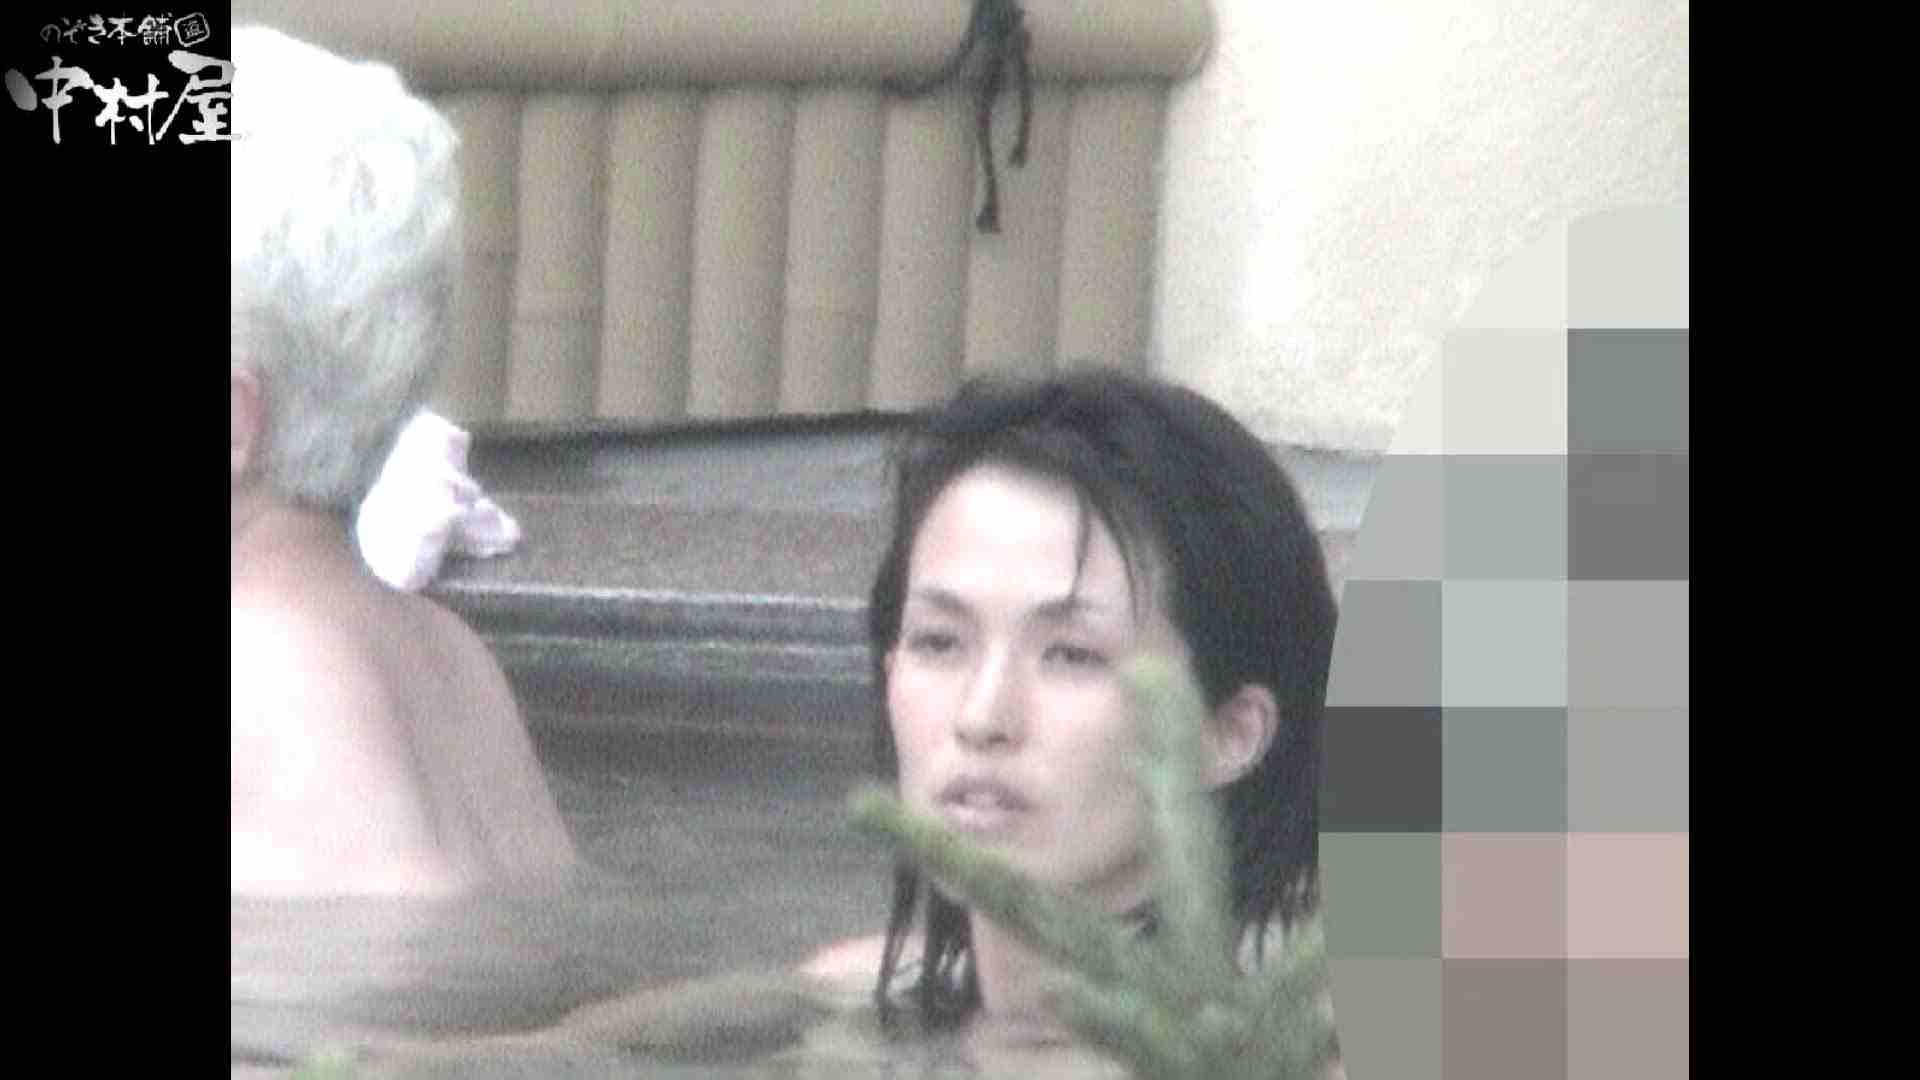 Aquaな露天風呂Vol.933 盗撮 おまんこ動画流出 78PICs 74